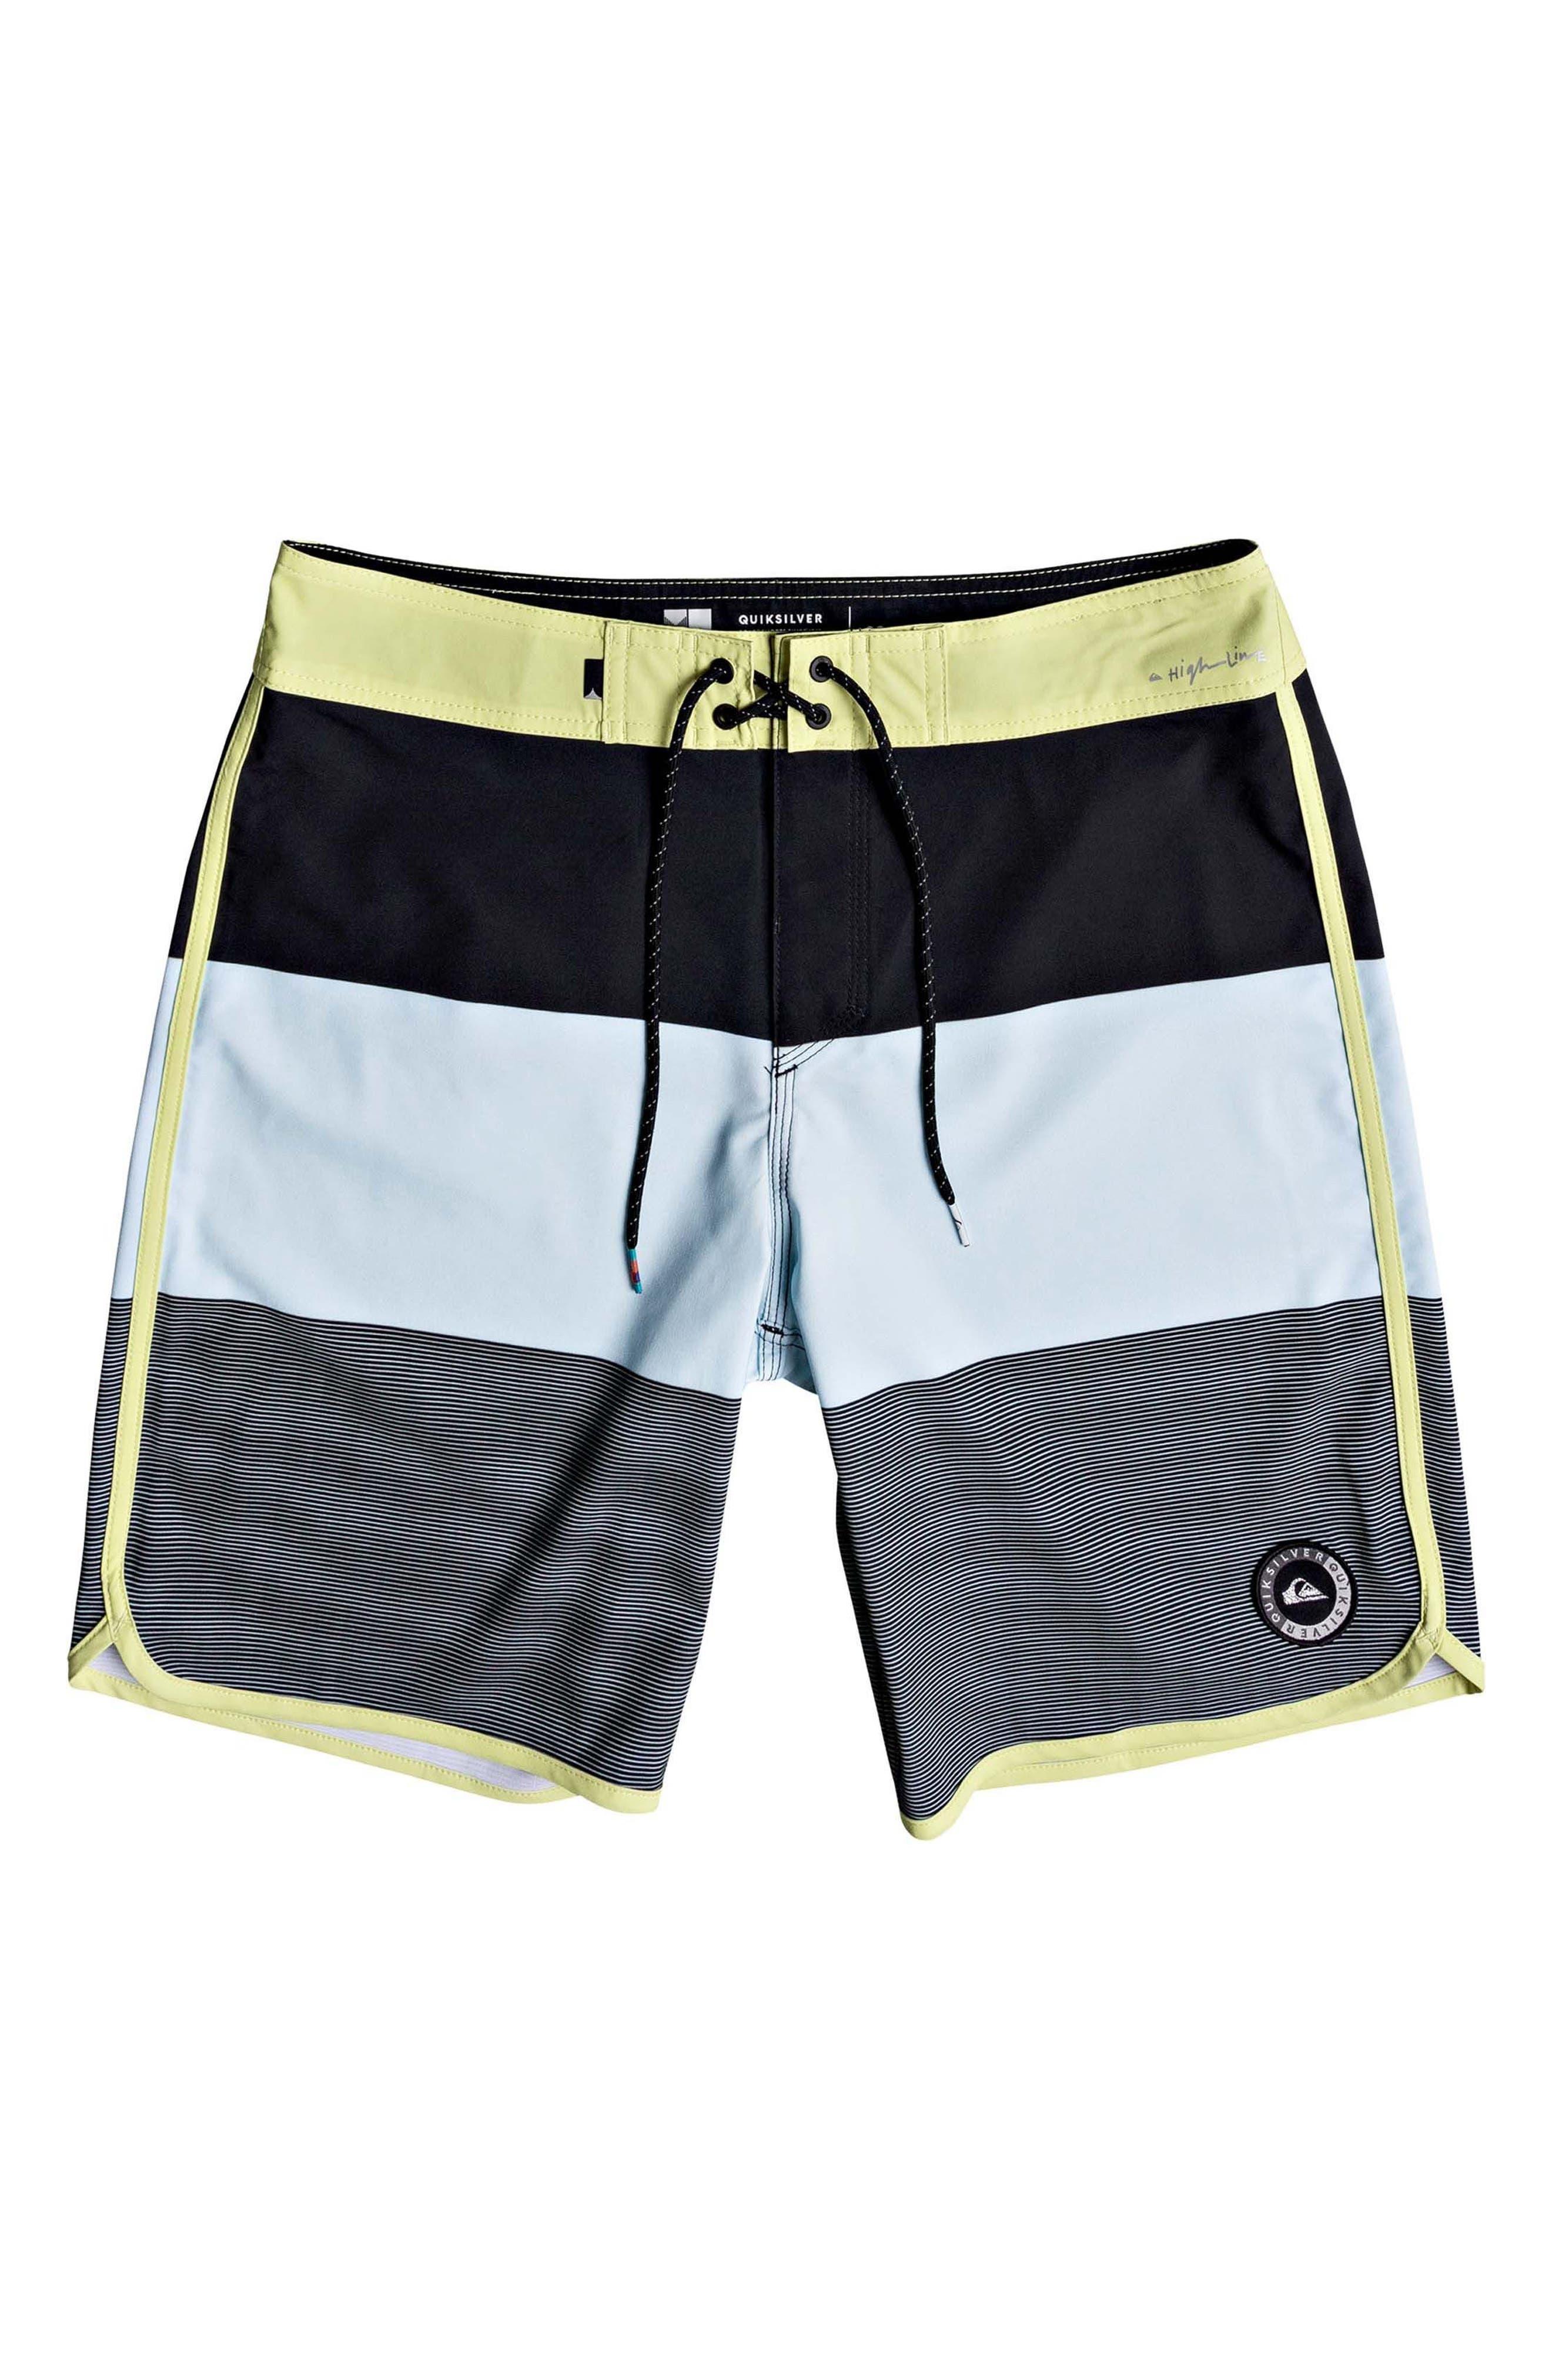 Quiksilver Highline Tijuana Board Shorts (Big Boys)